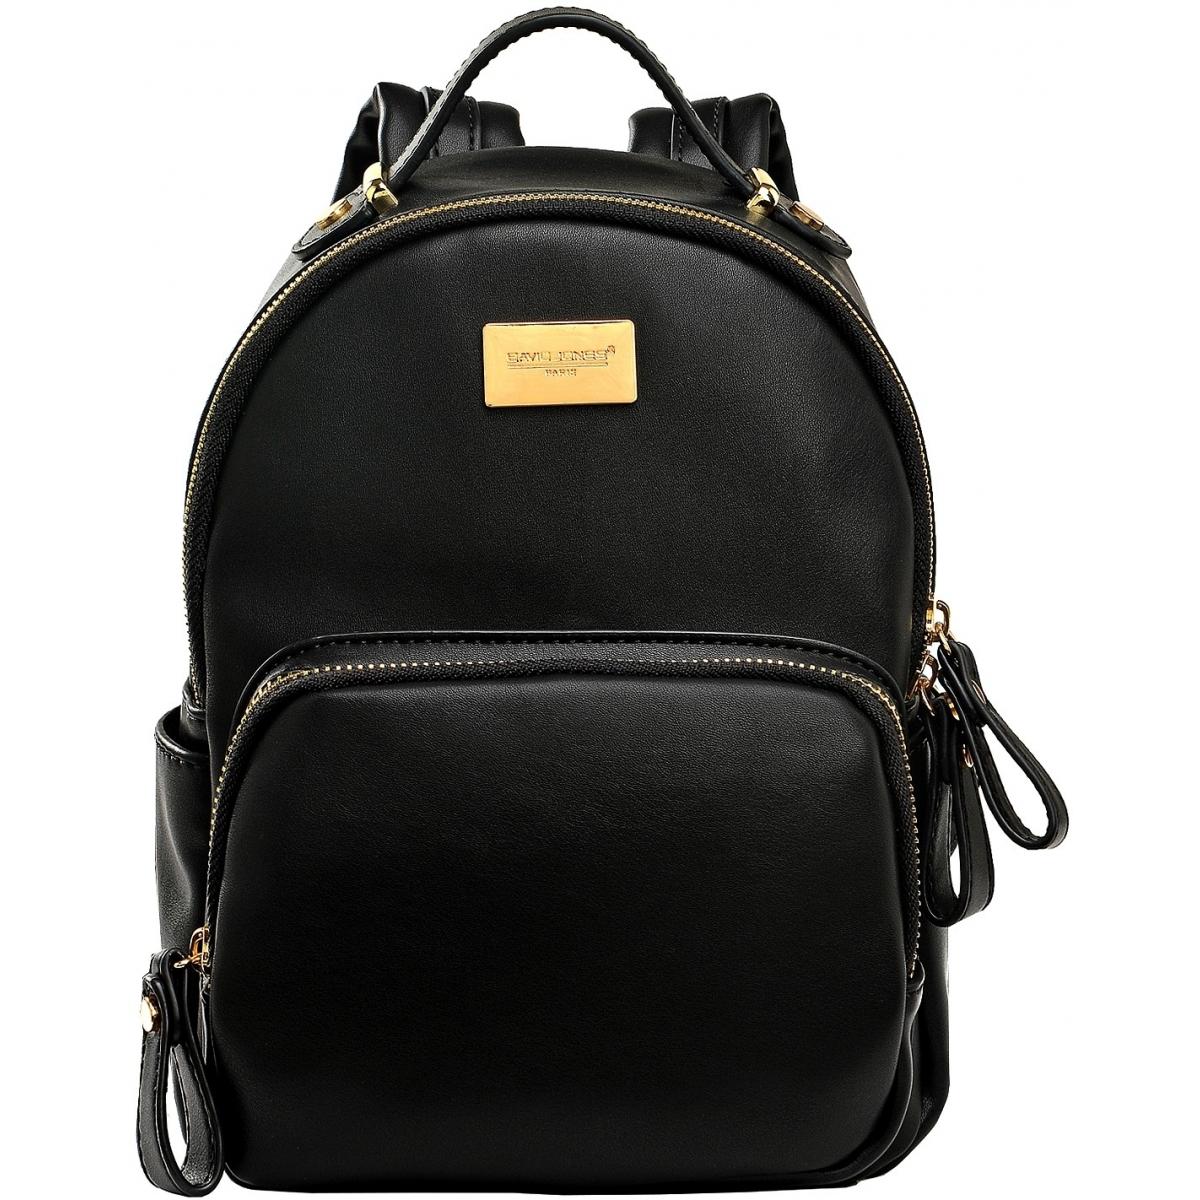 sac main dos taille s david jones djcm3075 couleur. Black Bedroom Furniture Sets. Home Design Ideas